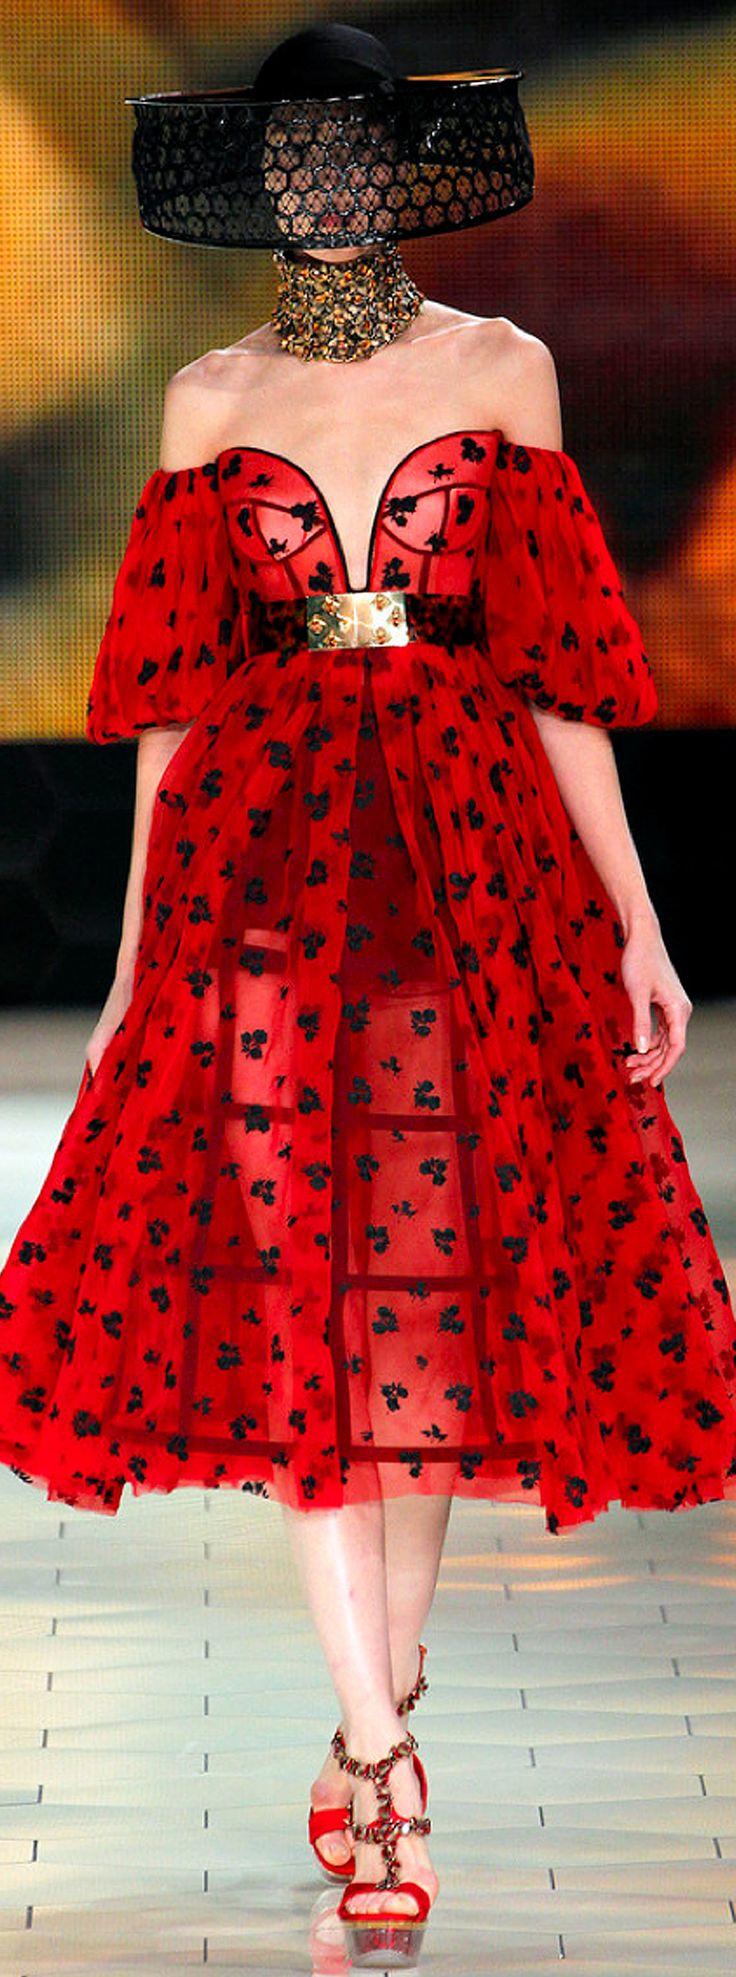 Alexander McQueen Spring 2013 Ready-to-Wear Collection via Très Haute Diva